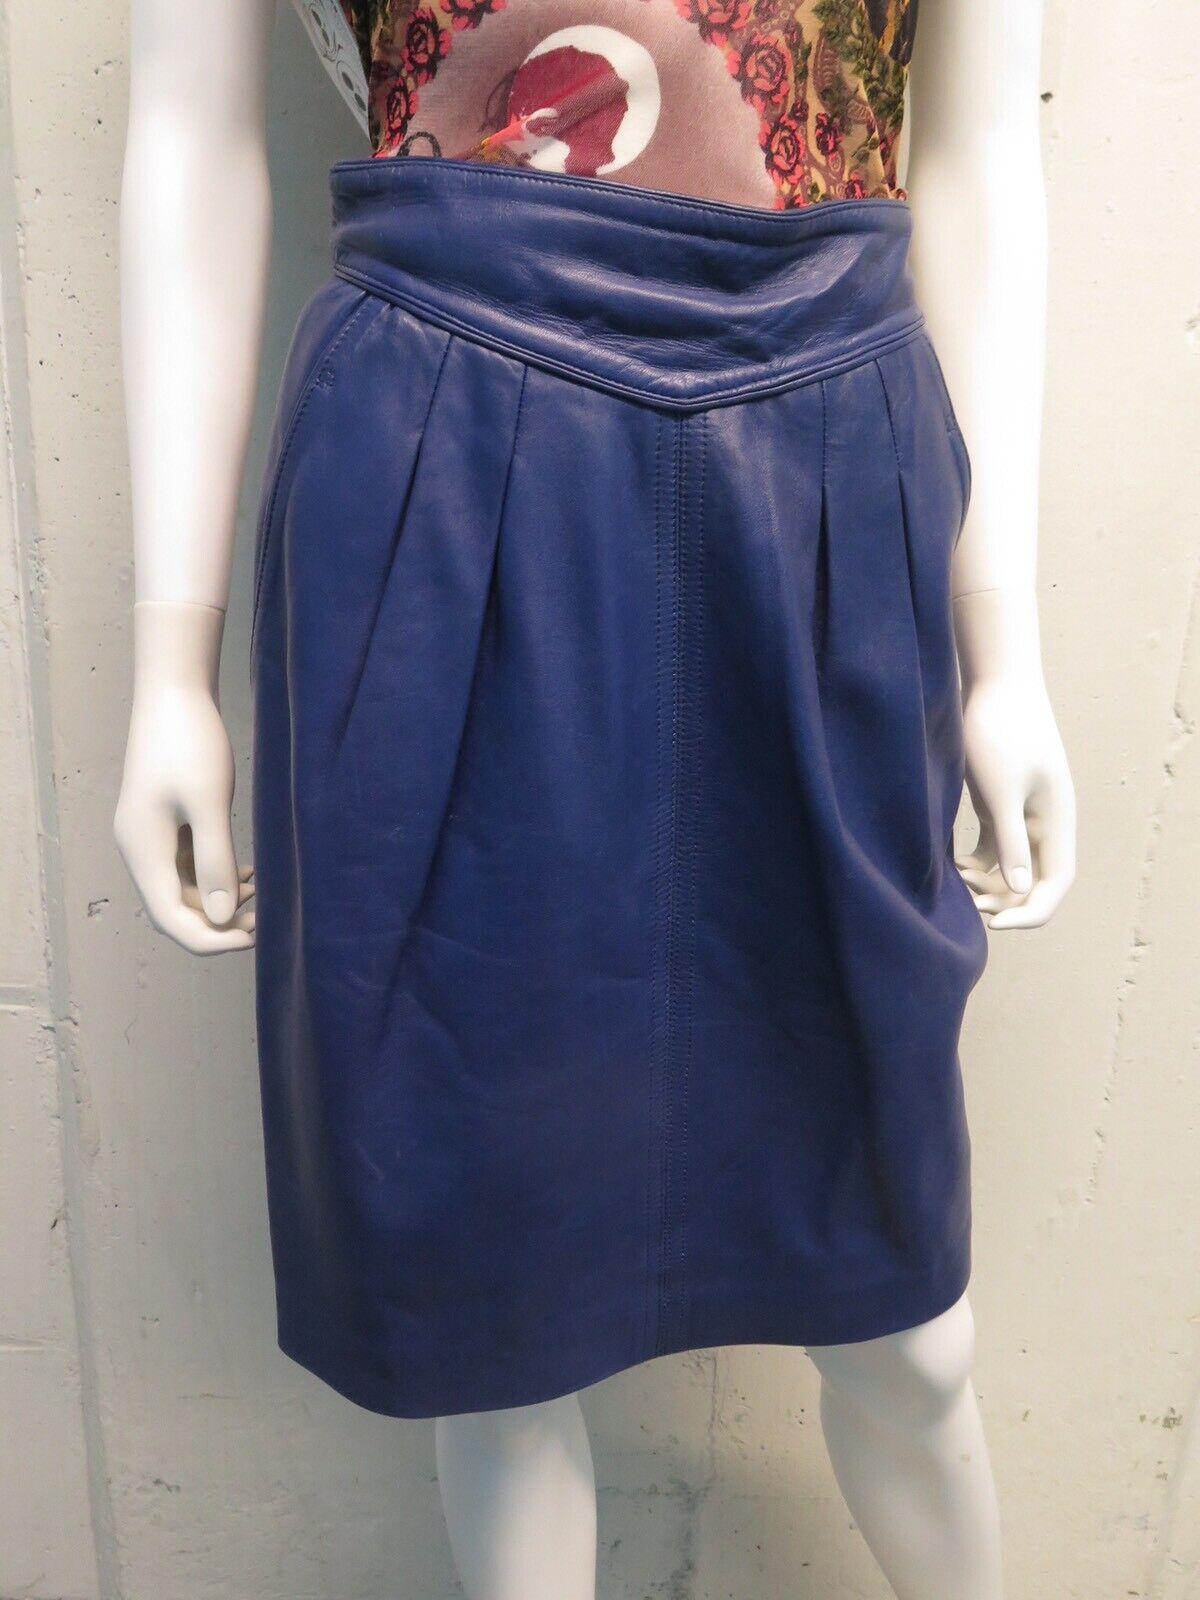 Vintage 80's Loewe Indigo Lambskin Leather Pencil Skirt Sz S